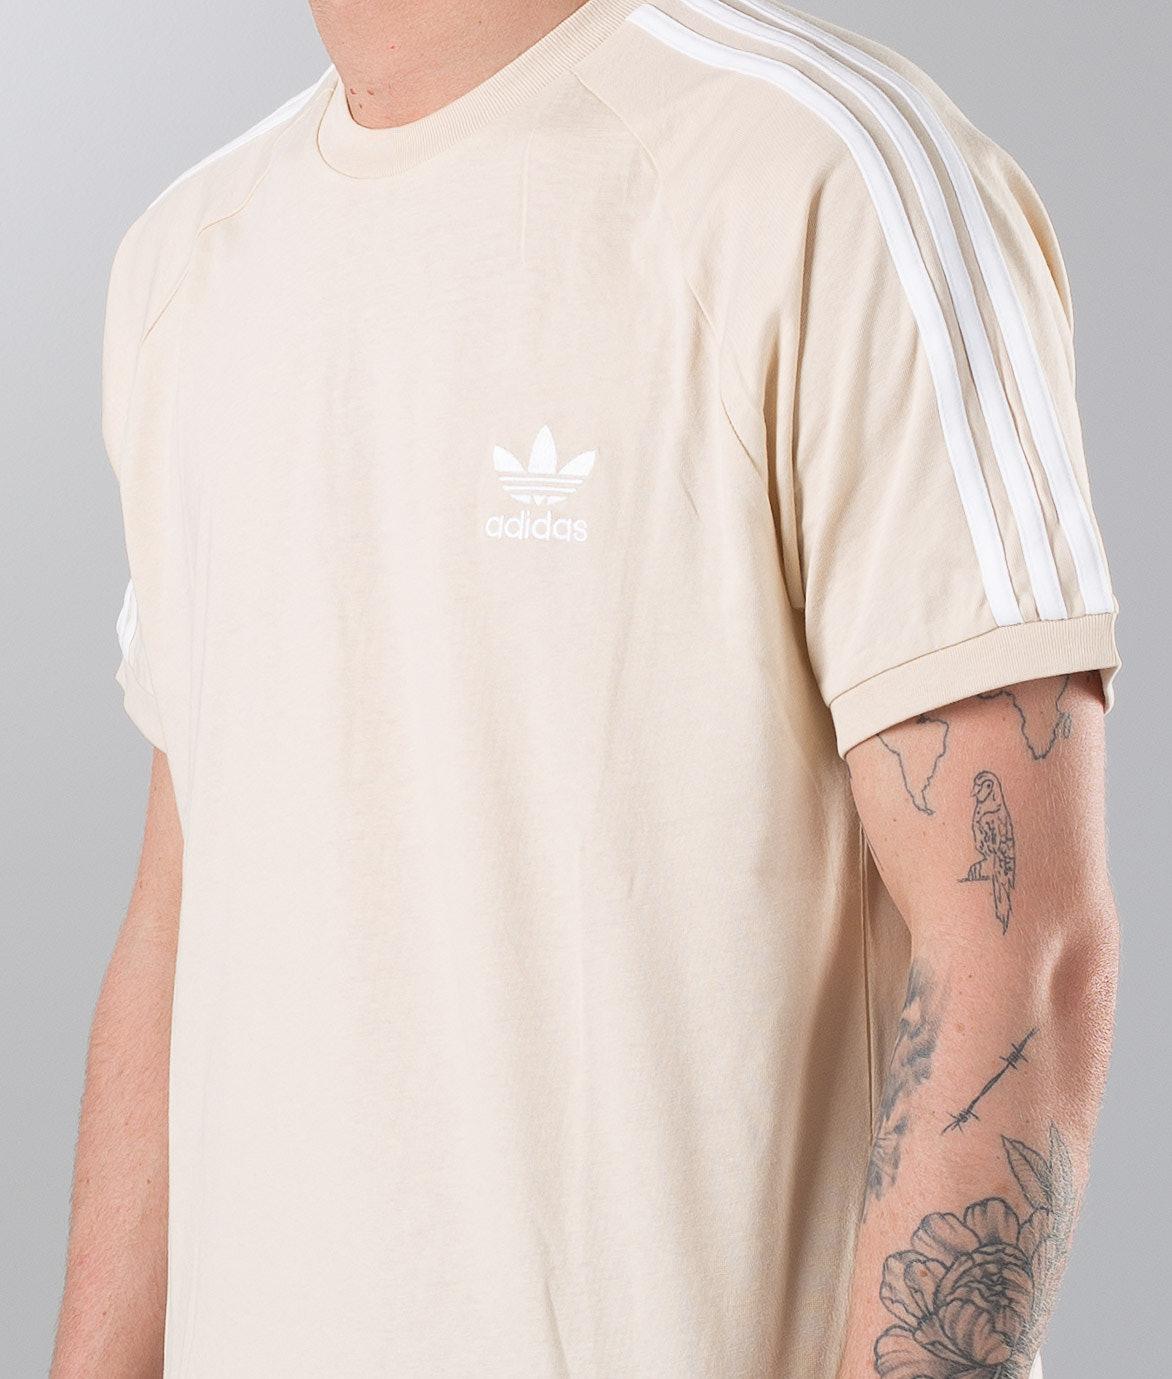 a551020069704 Adidas Originals 3-Stripes T-shirt Linen - Ridestore.se